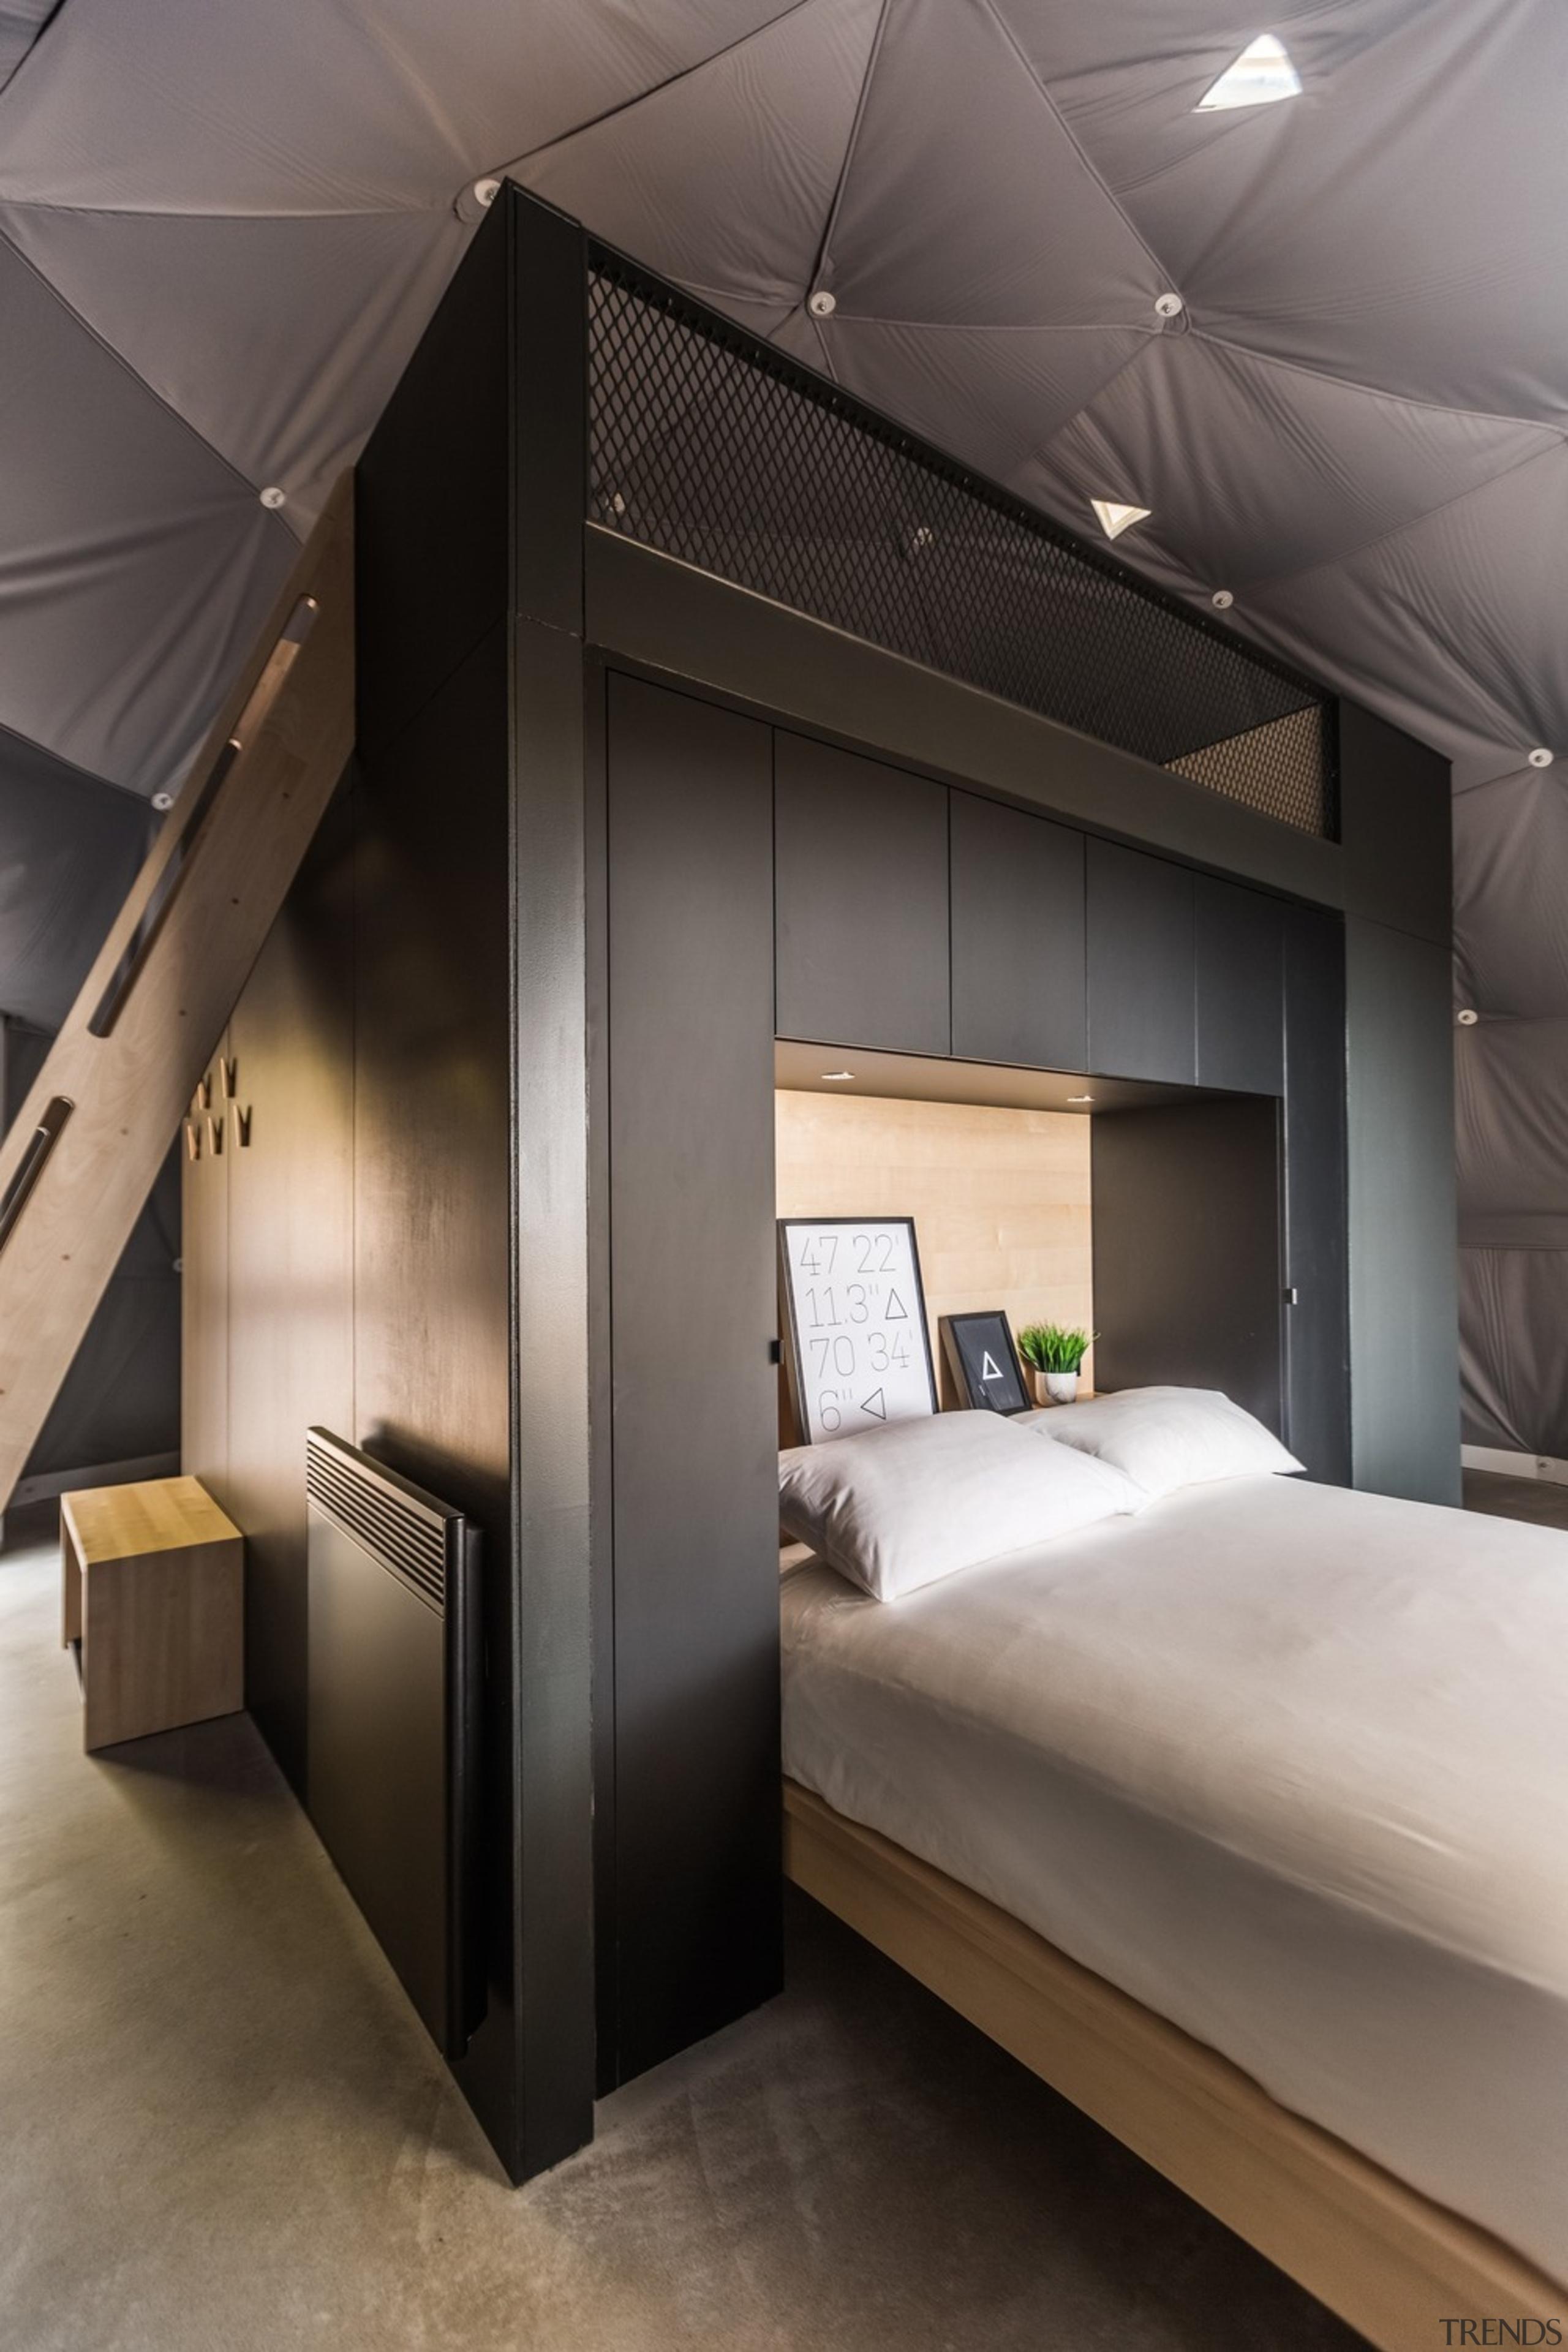 Dome 7 - architecture | ceiling | interior architecture, ceiling, interior design, room, gray, black